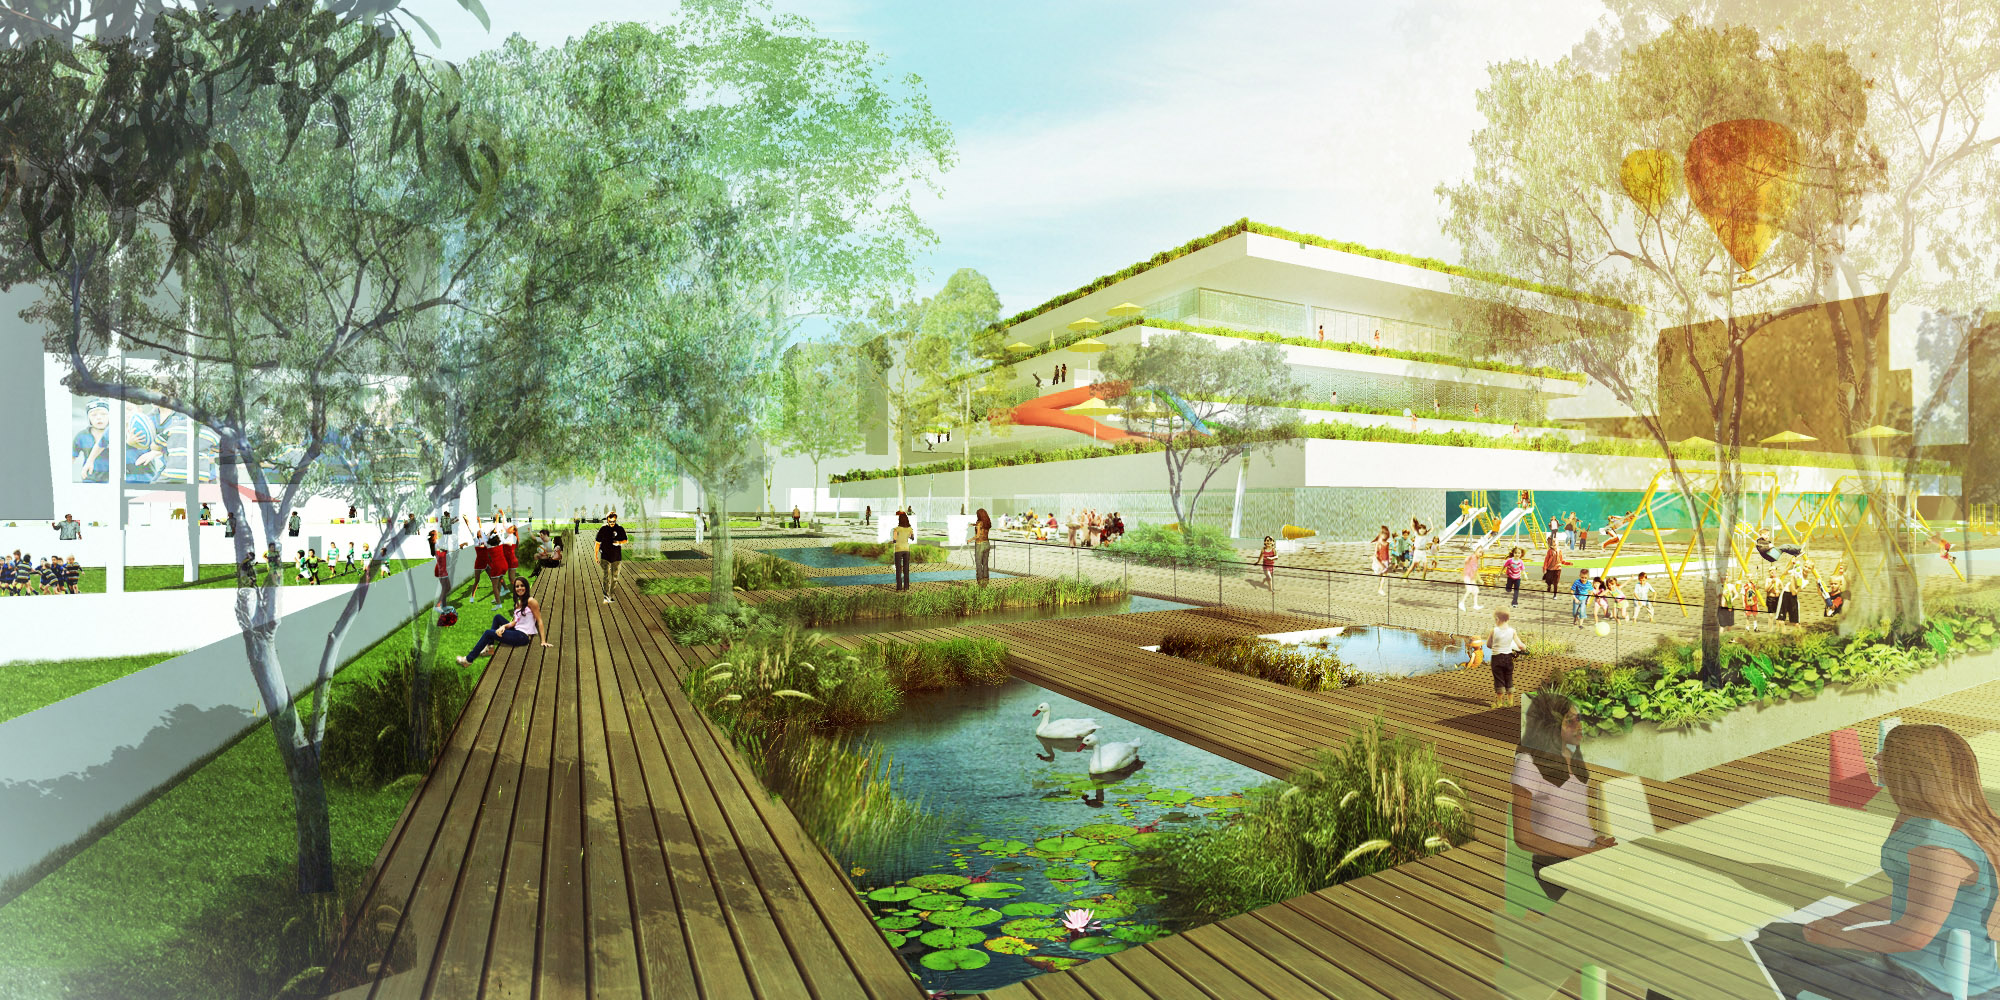 04 - Waterscape - Lockhart Krause Architect.jpg